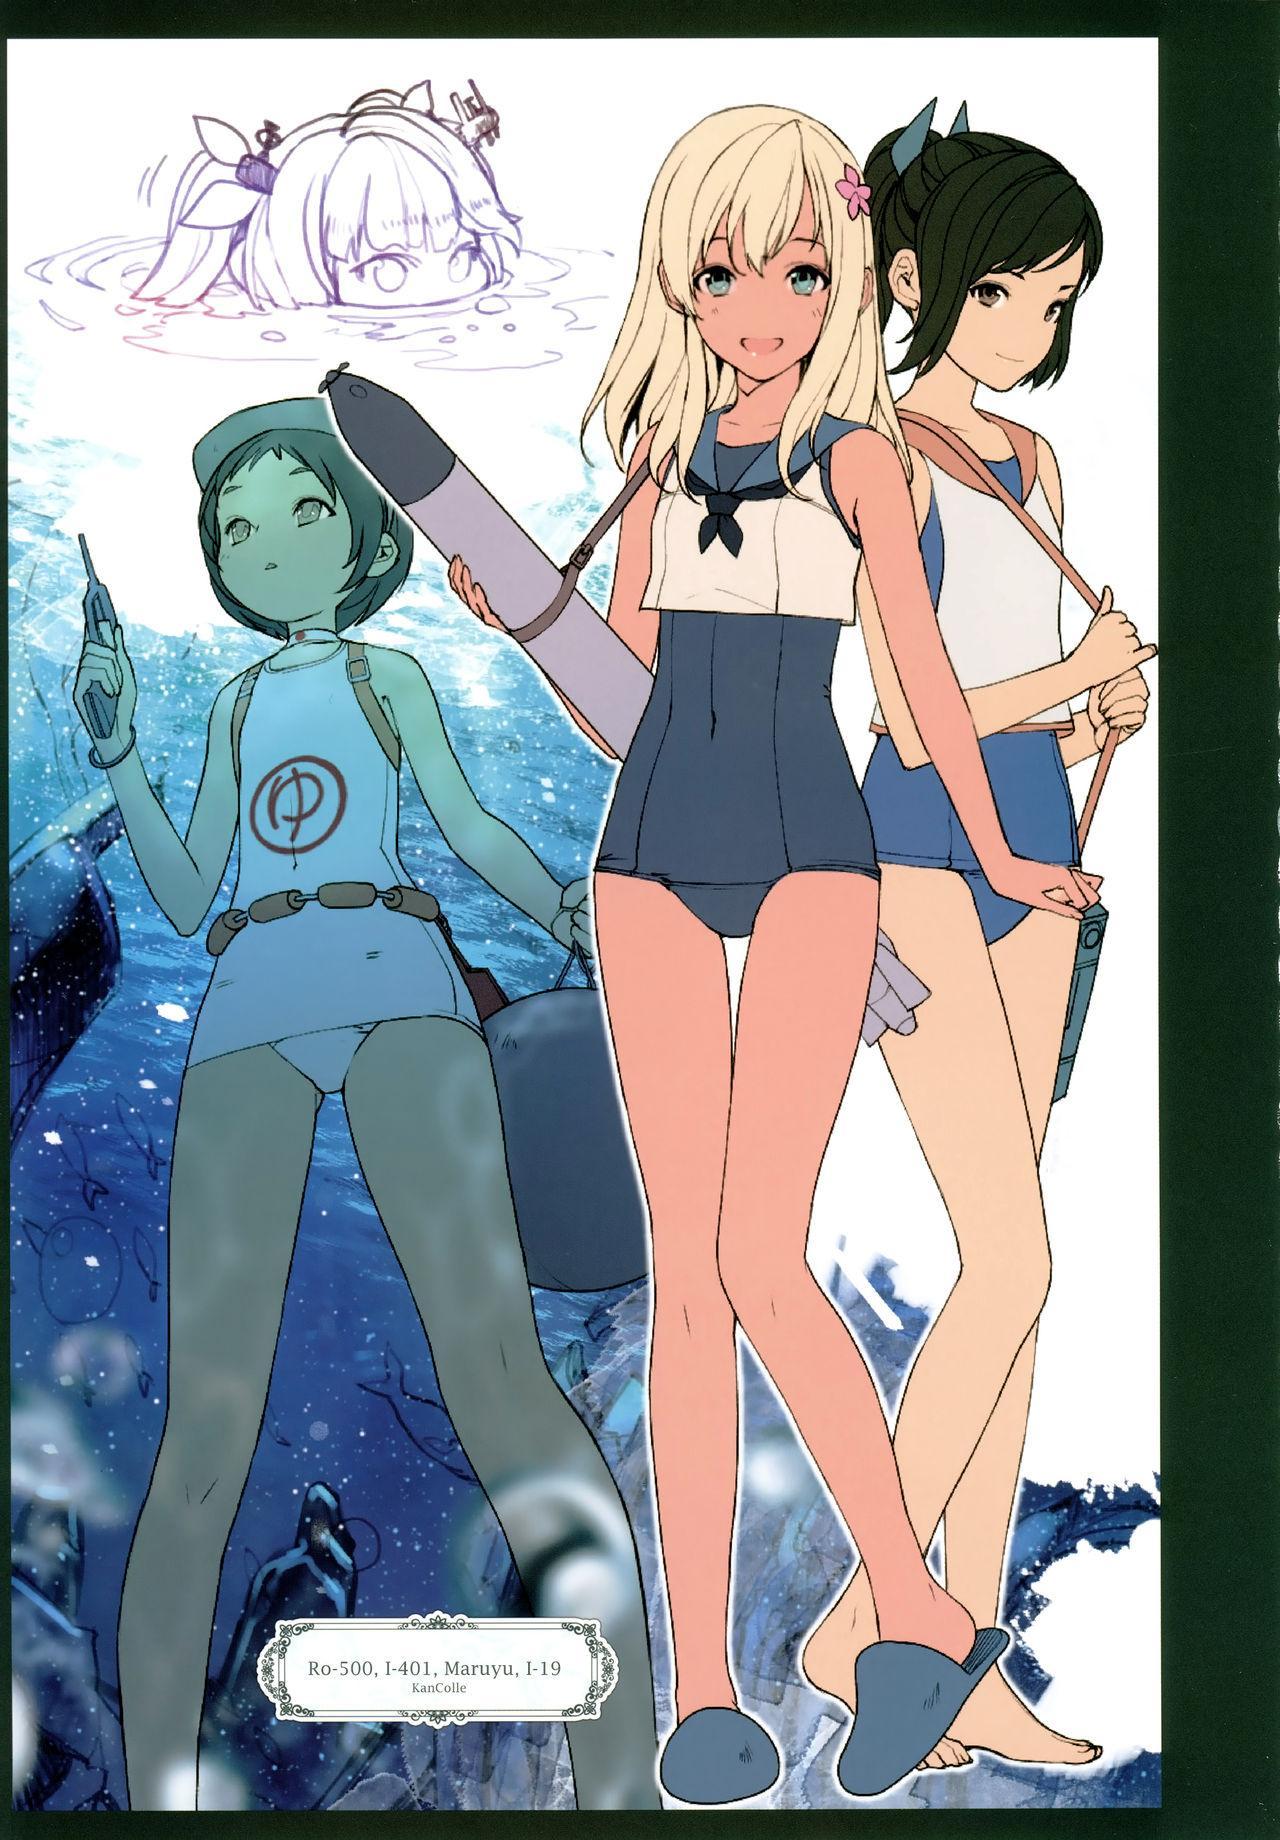 H na Toshiue Chara no Rakugaki - Rough Manga Hon | A Collection of Sketches and Rough Manga of Hot MILFs 5